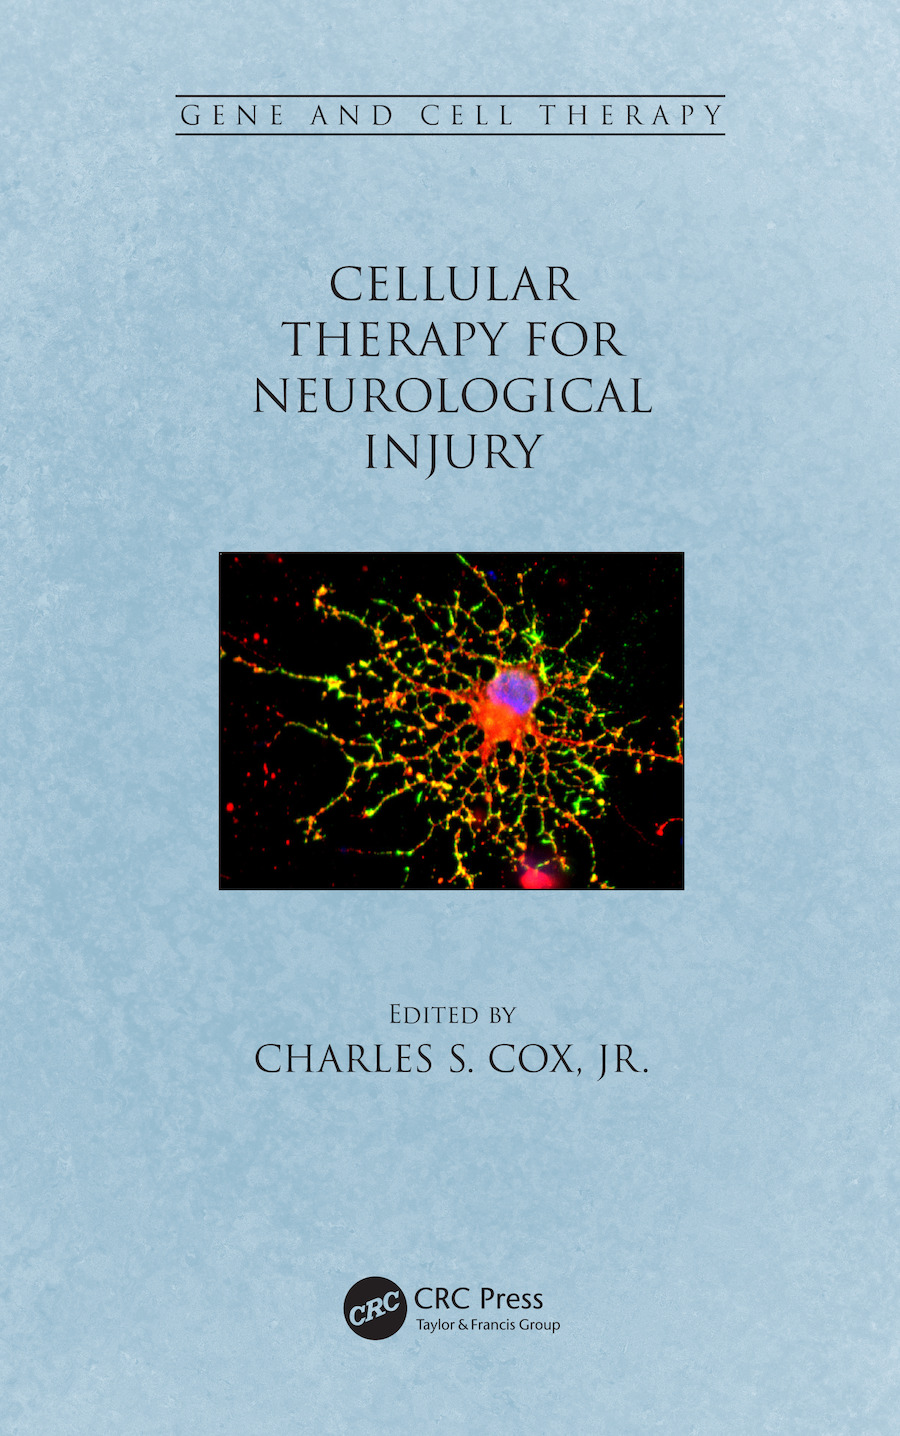 Oligodendrocyte Precursor Cells in Spinal Cord Injury Repair